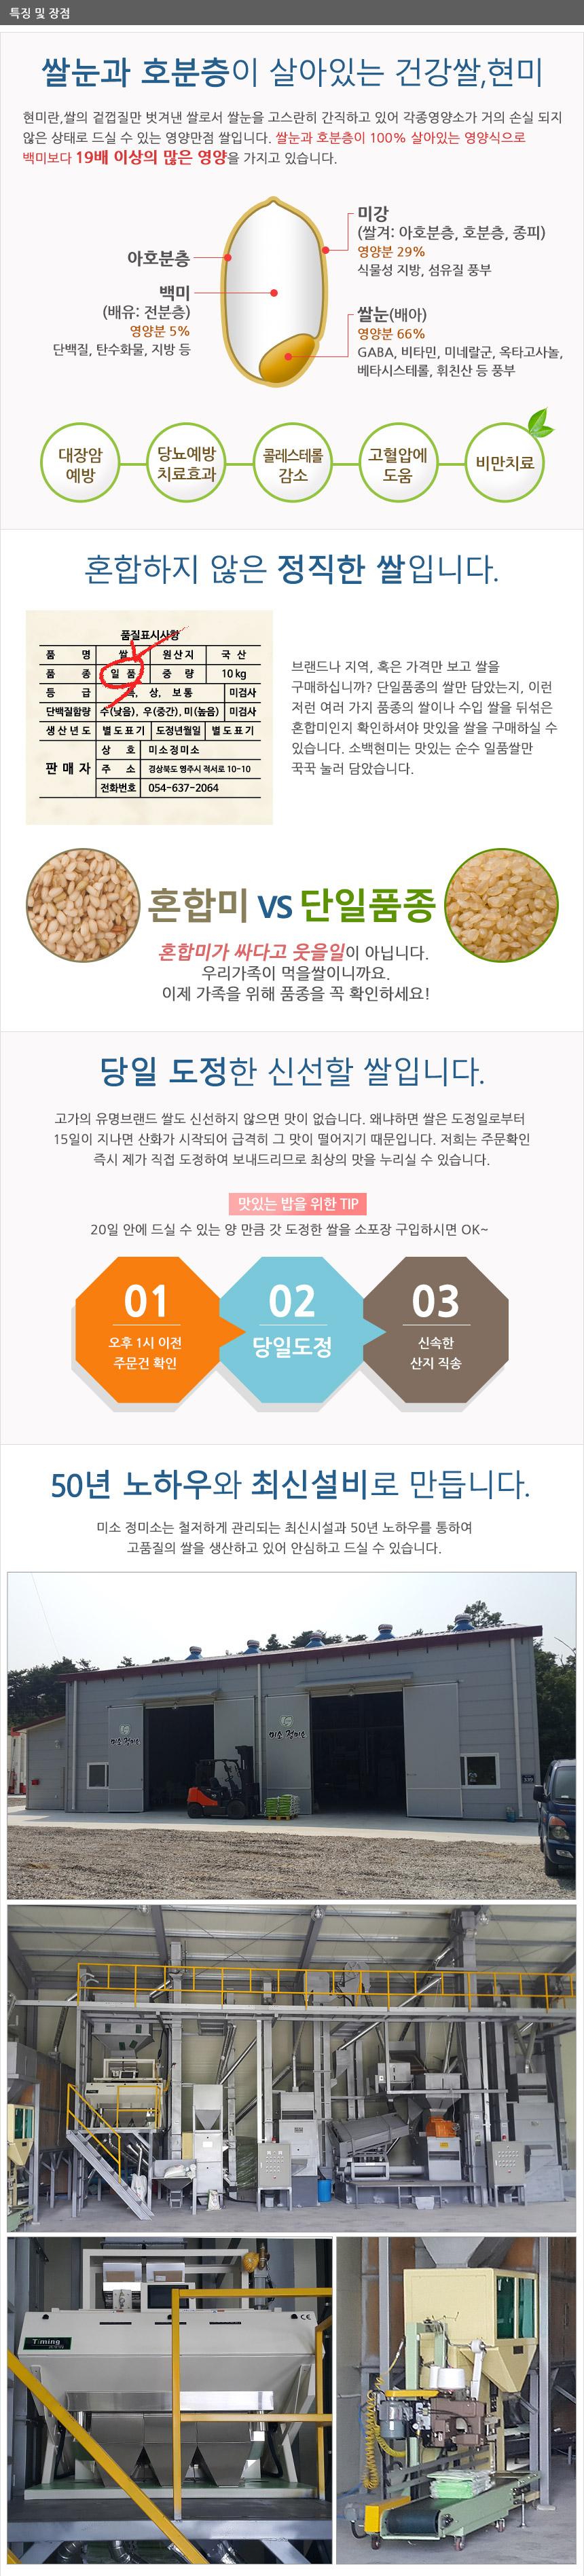 hyun_03